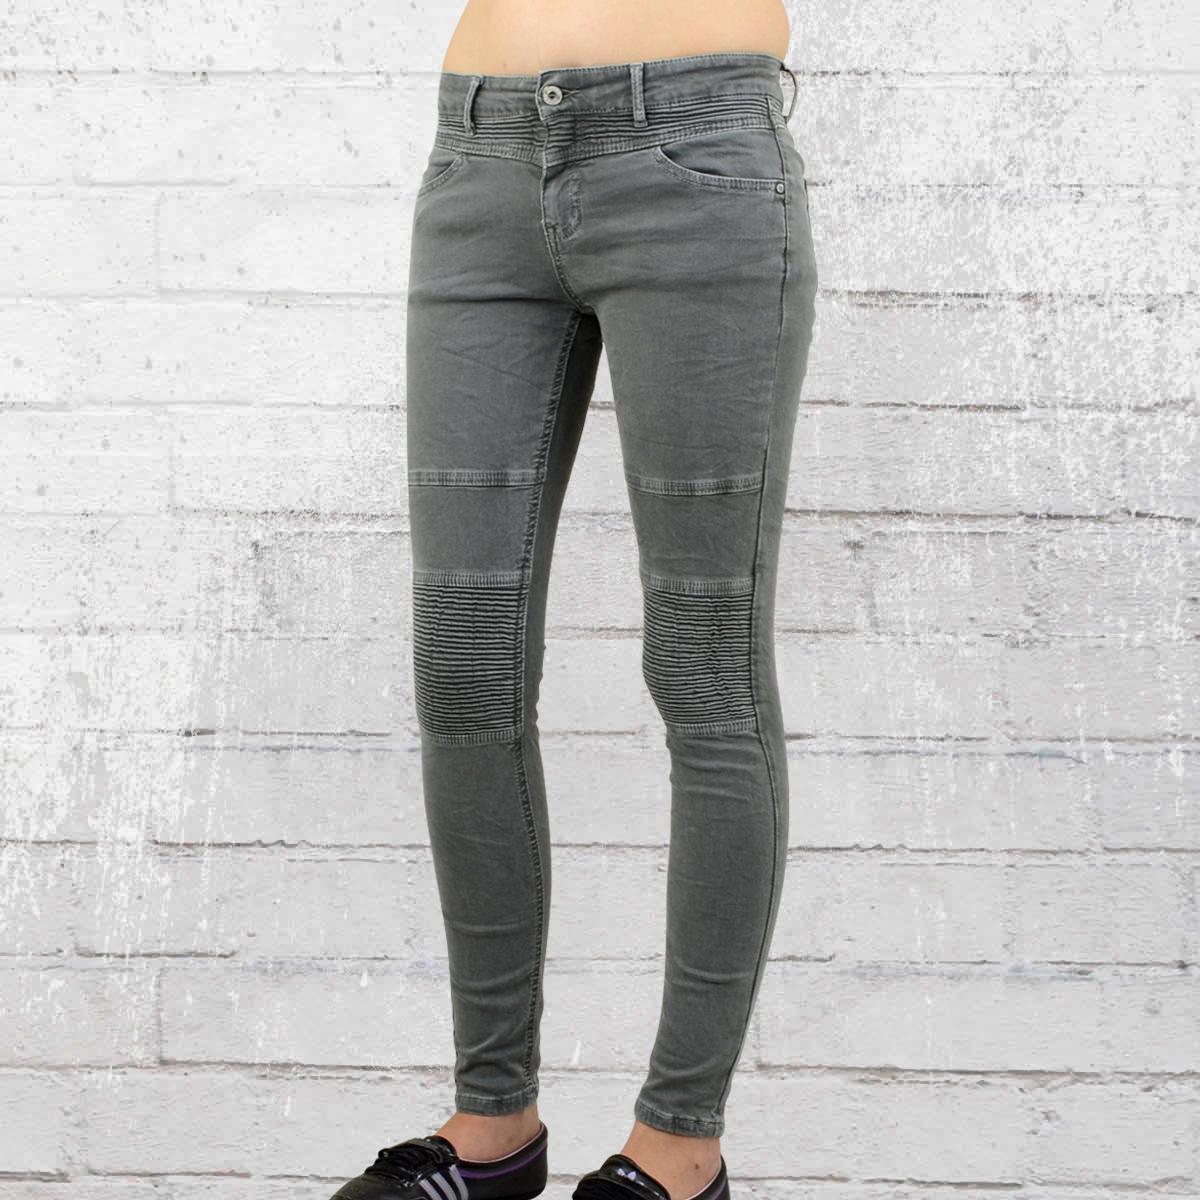 jetzt bestellen monday afternoon damen stretch jeans hose grau. Black Bedroom Furniture Sets. Home Design Ideas